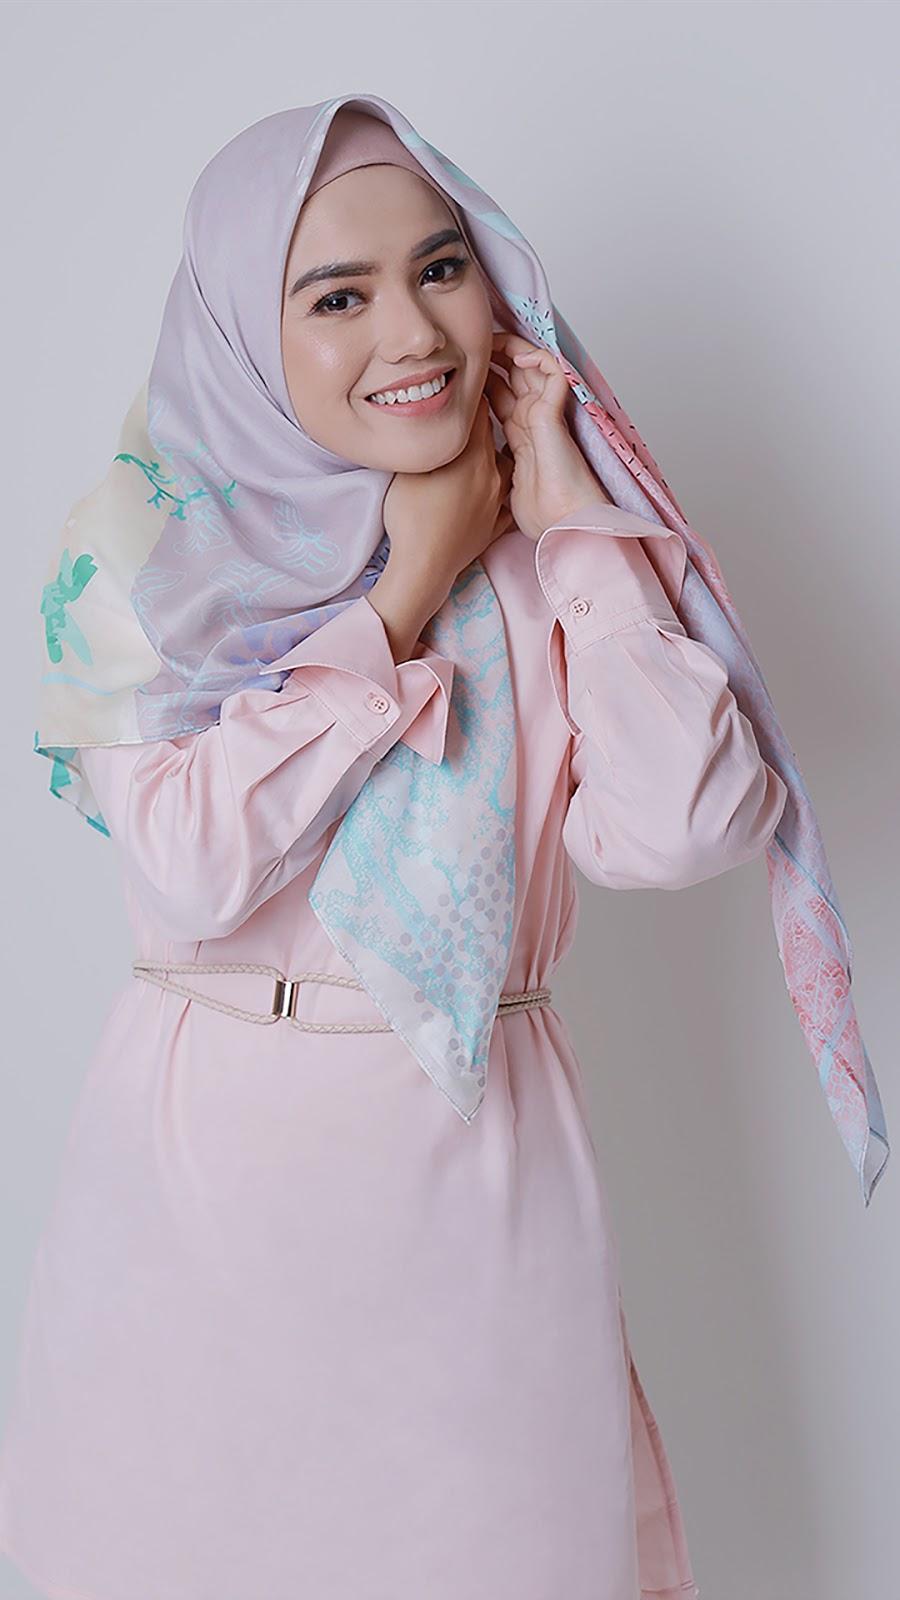 wallpaper muslimah terbaru gadis Cewek IGO manis